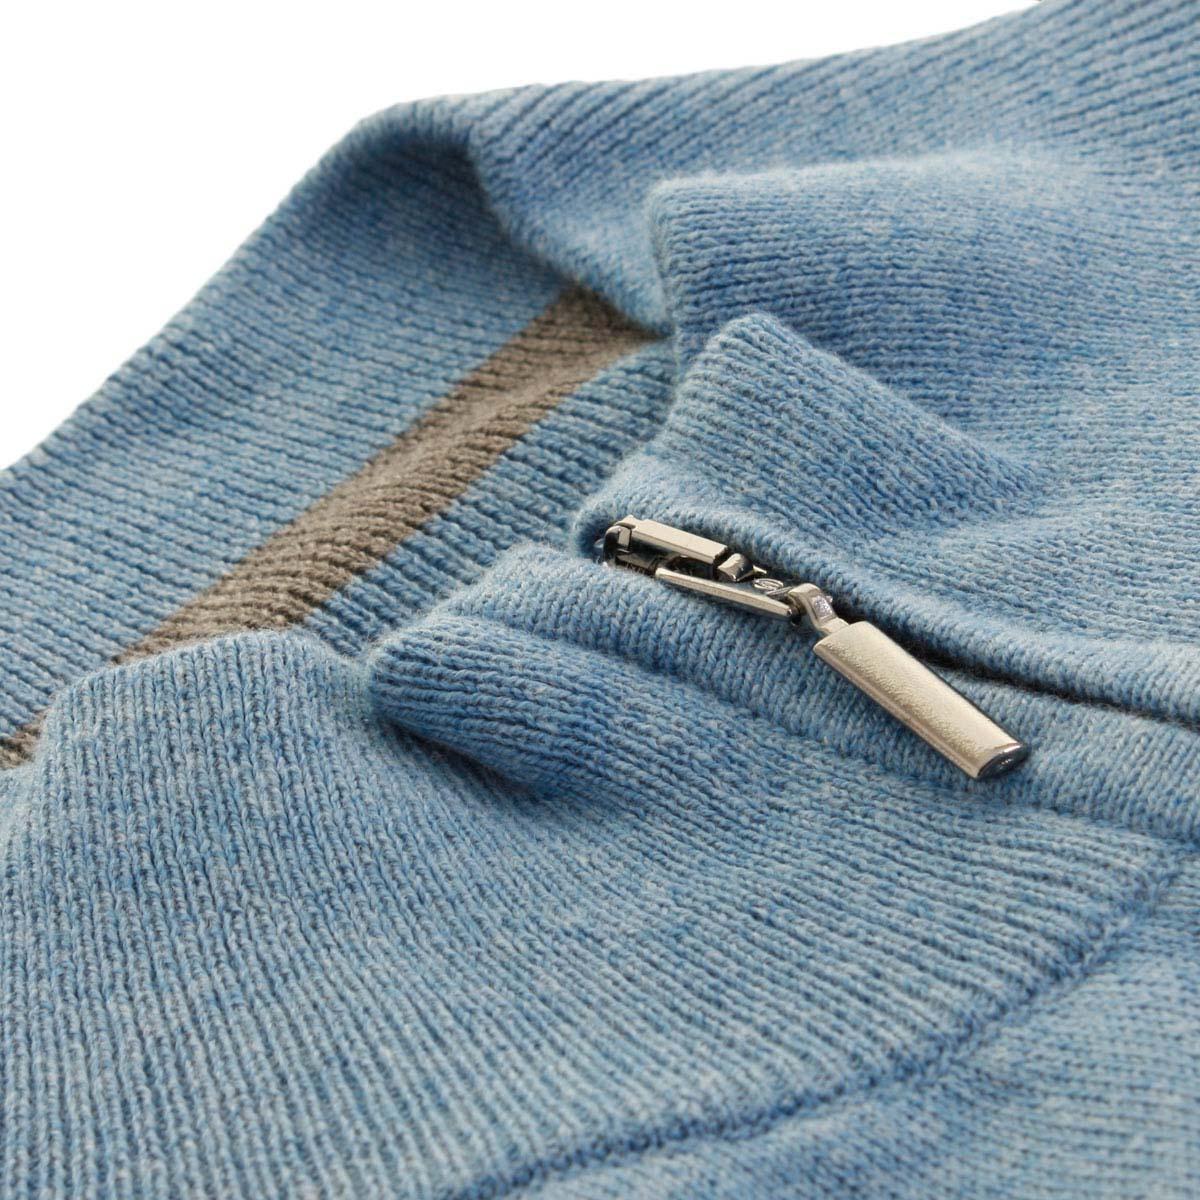 Calvin-Klein-Golf-Mens-CK-1-4-Zip-Sleeveless-Sweater-Vest-Gilet-27-OFF-RRP thumbnail 35